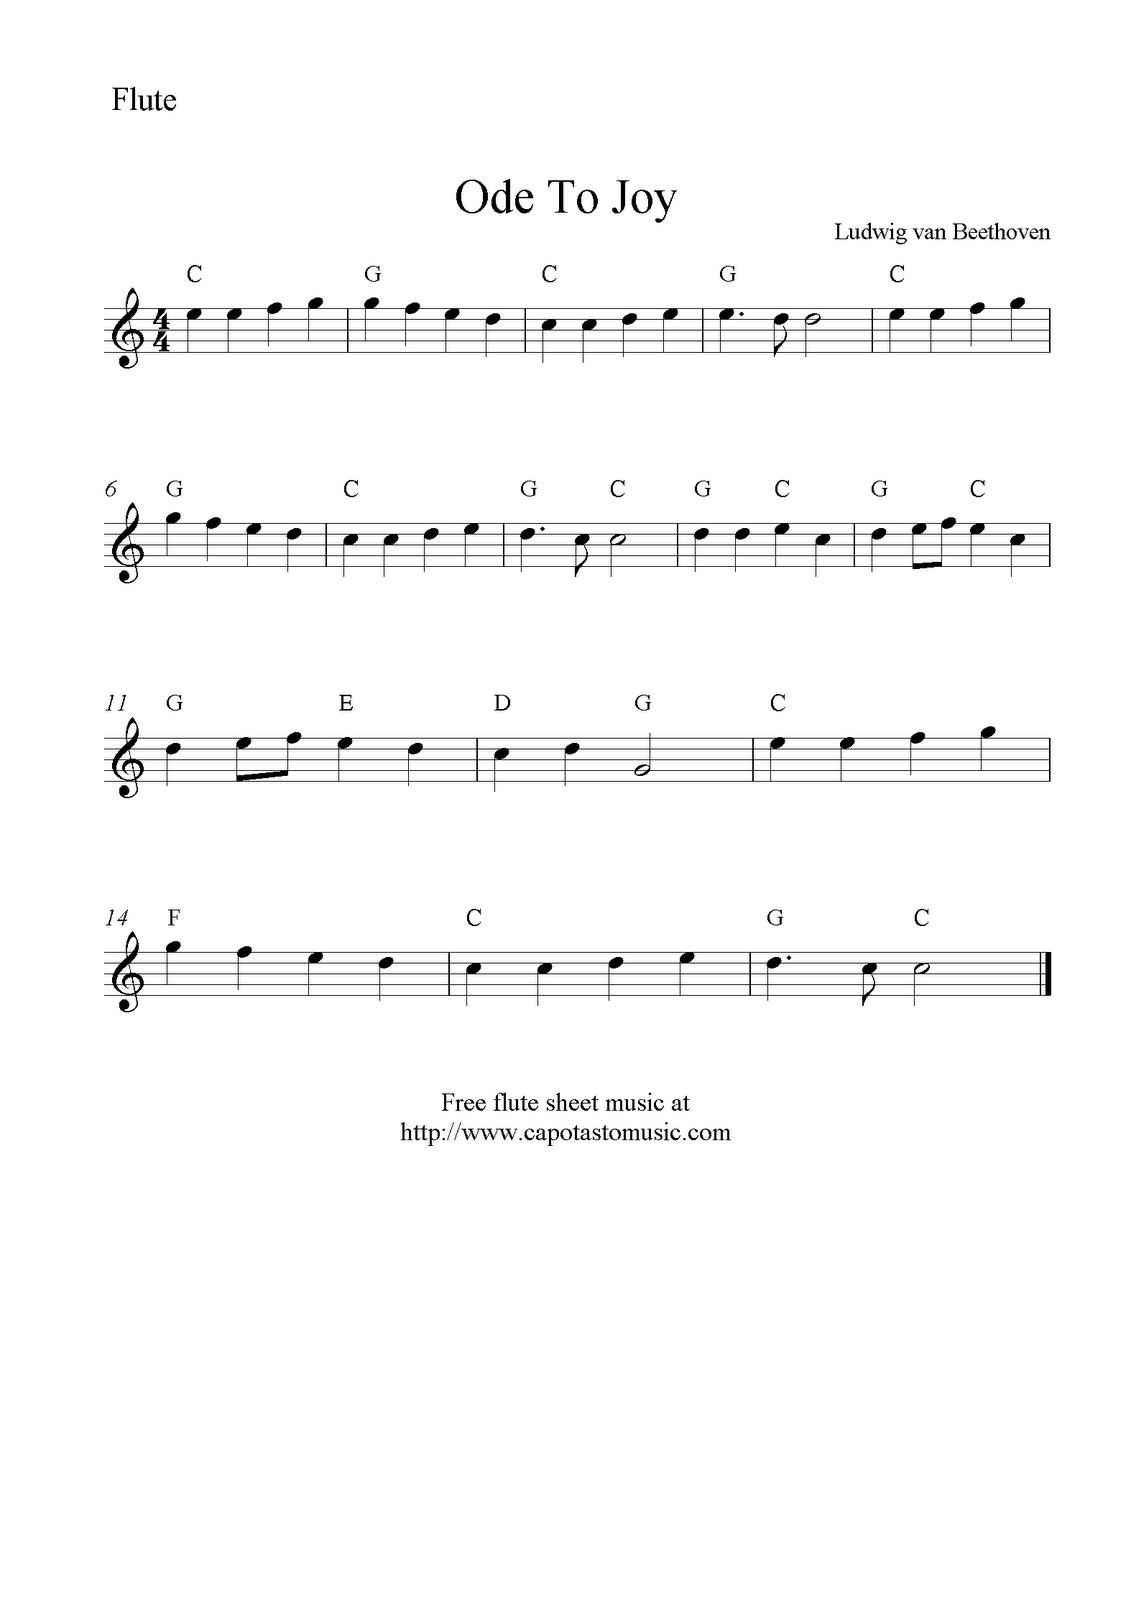 Ode to joy free flute sheet music notes